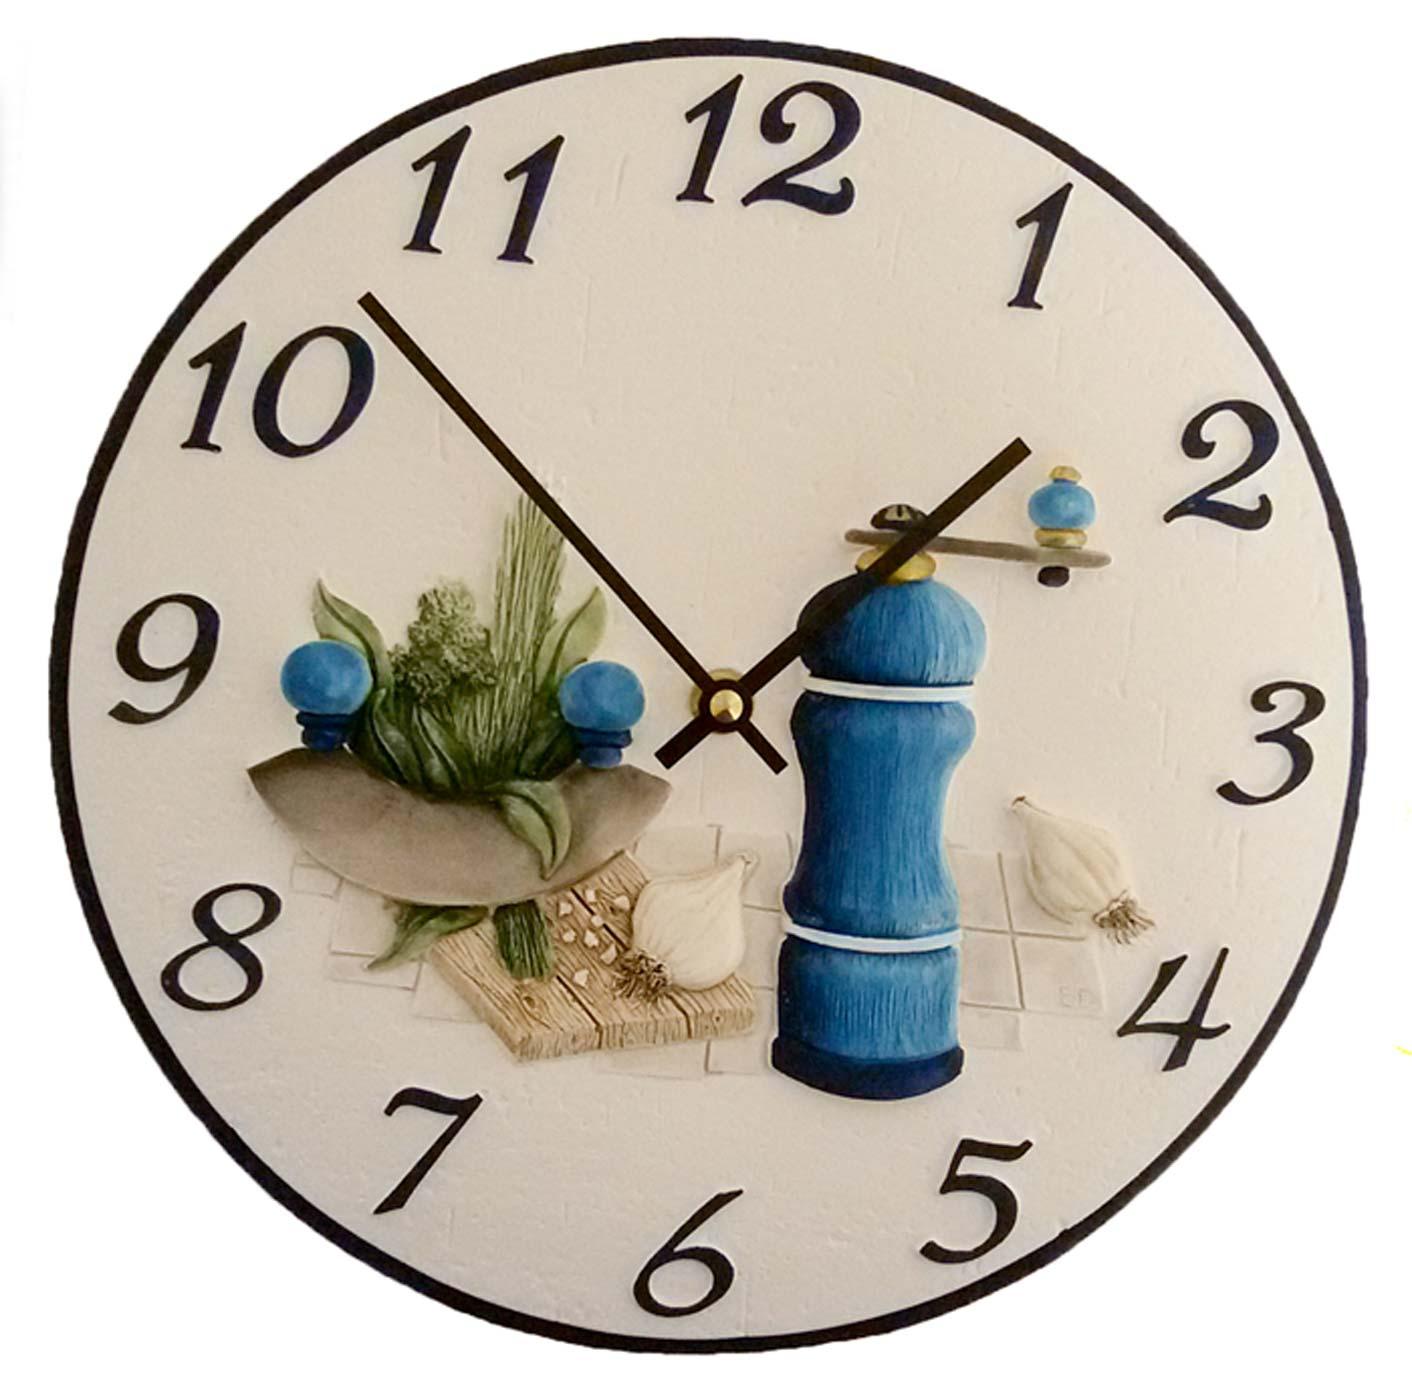 terrastudio 00 2401 horloge murale horloge de cuisine nouveau ebay. Black Bedroom Furniture Sets. Home Design Ideas